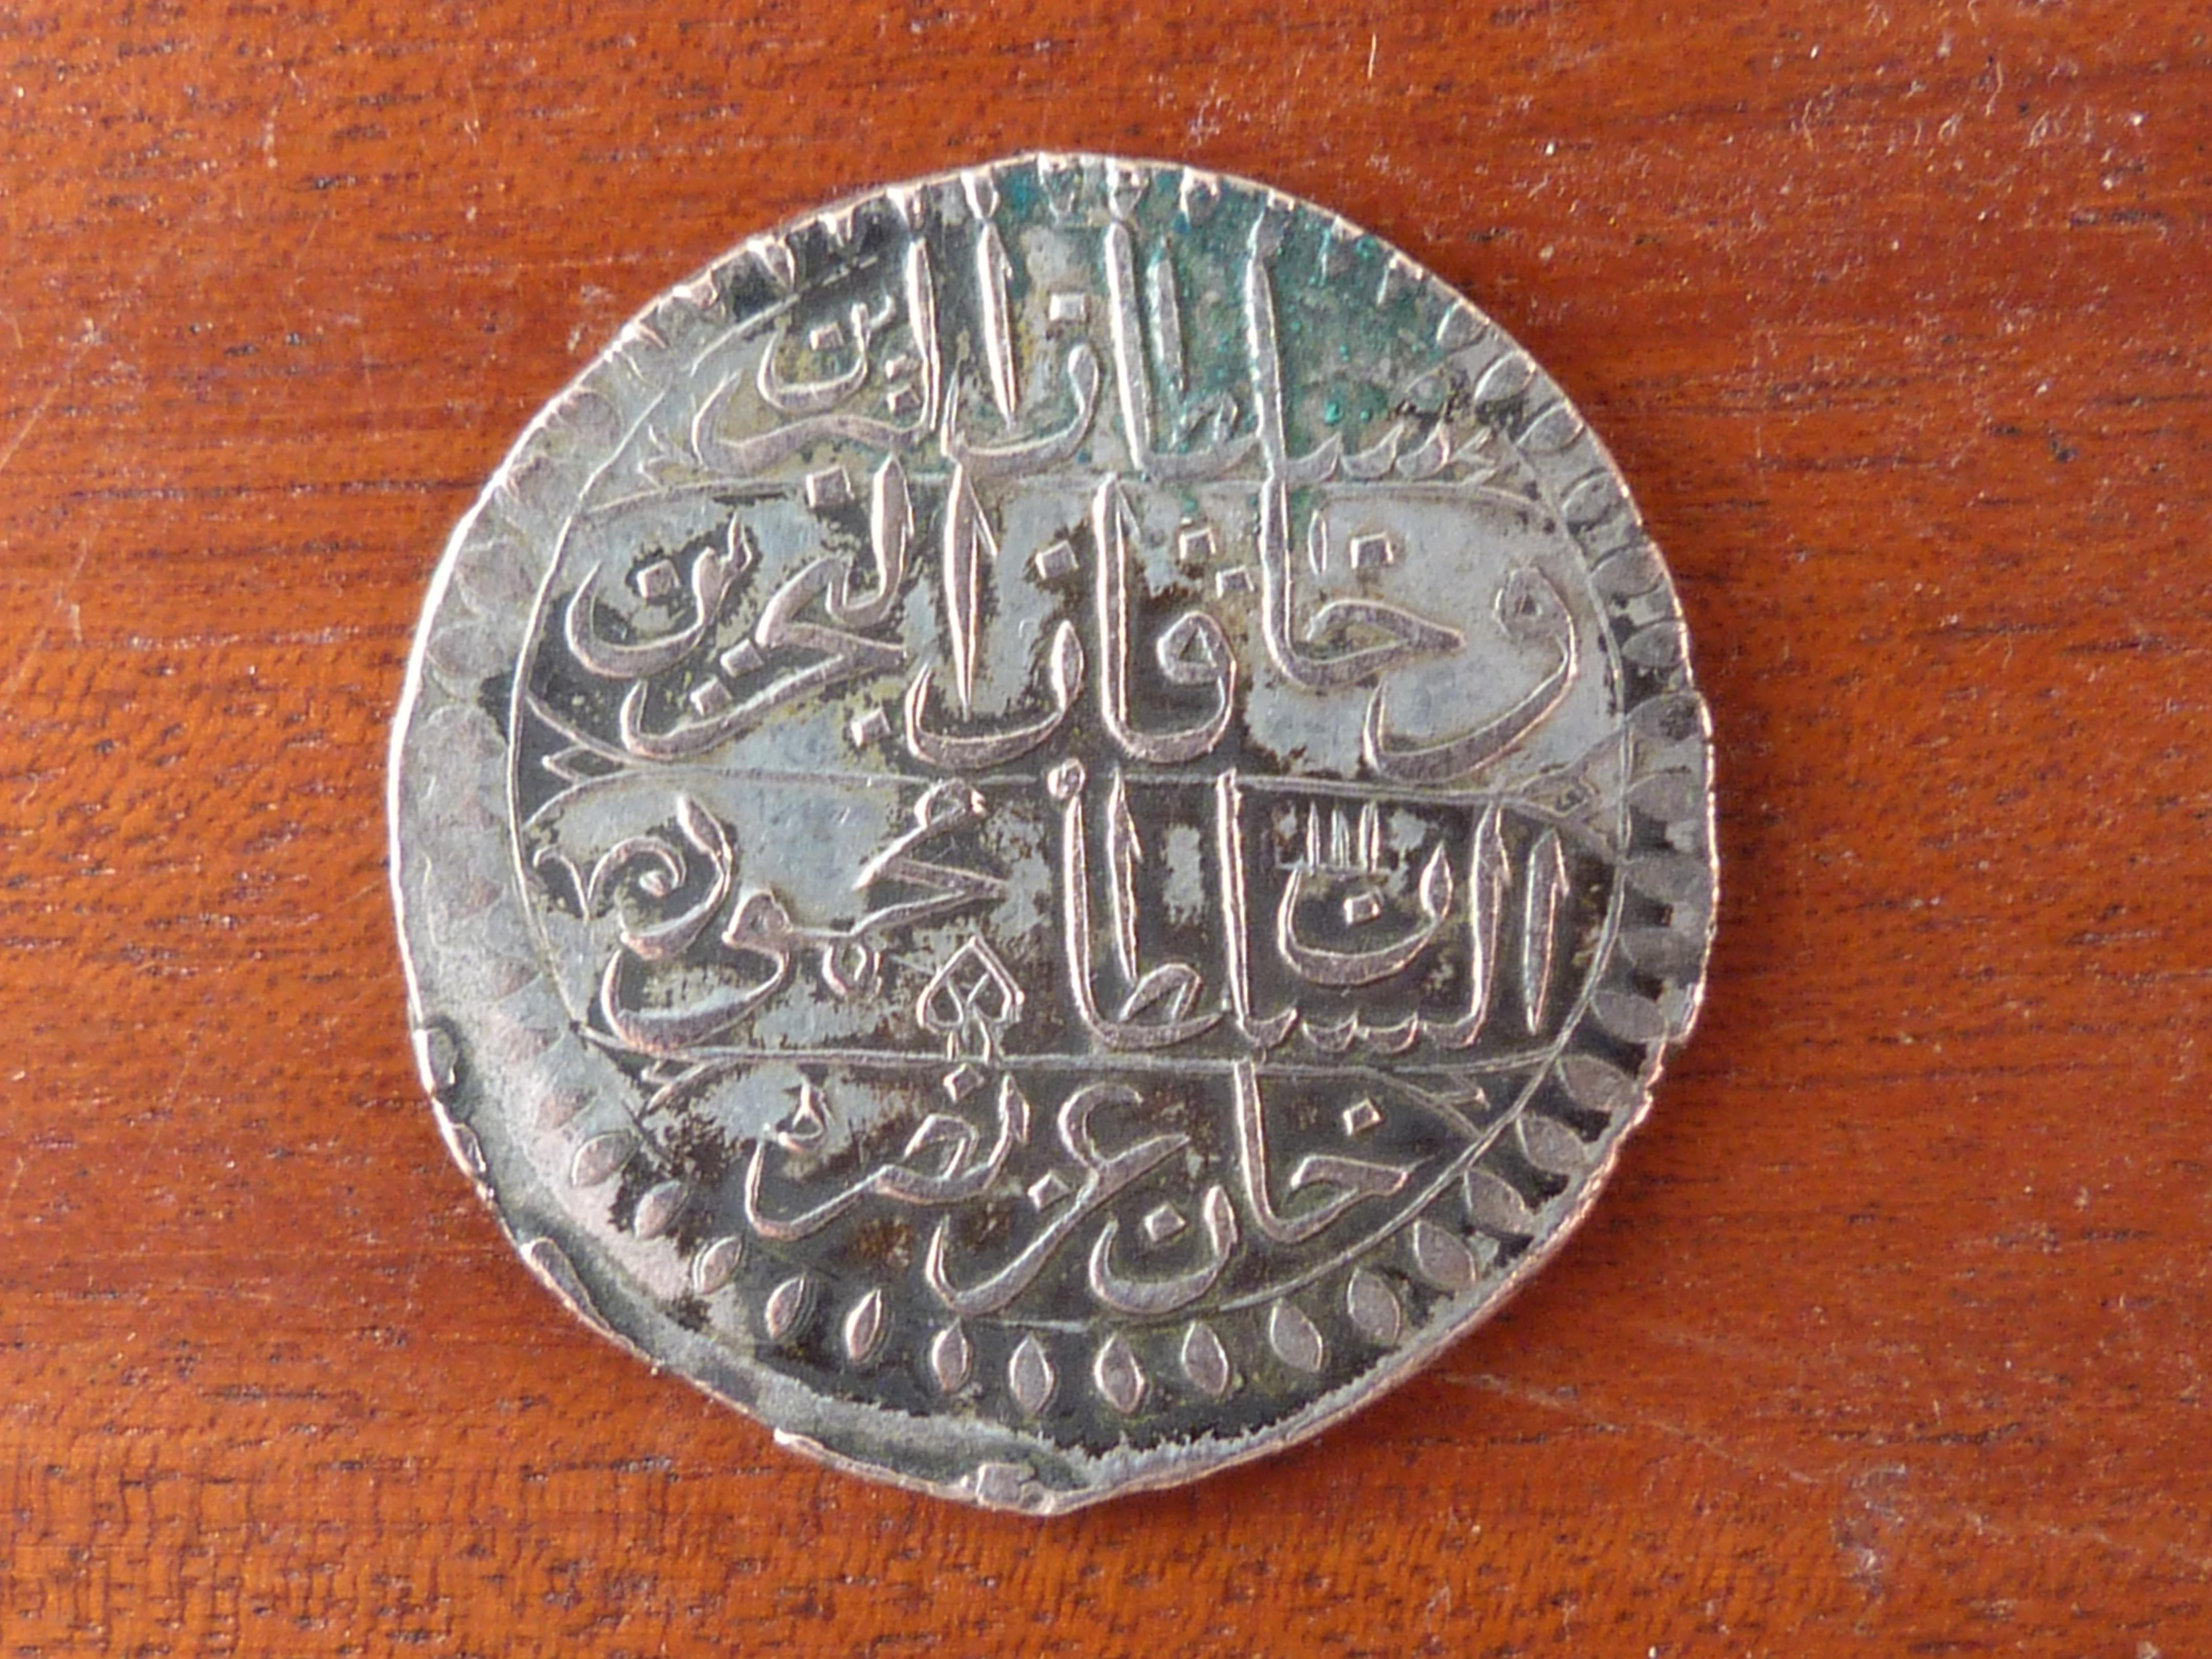 File:Tunisian rial of Mahmud II 1233 AH - 1817-1818 AD obverse.